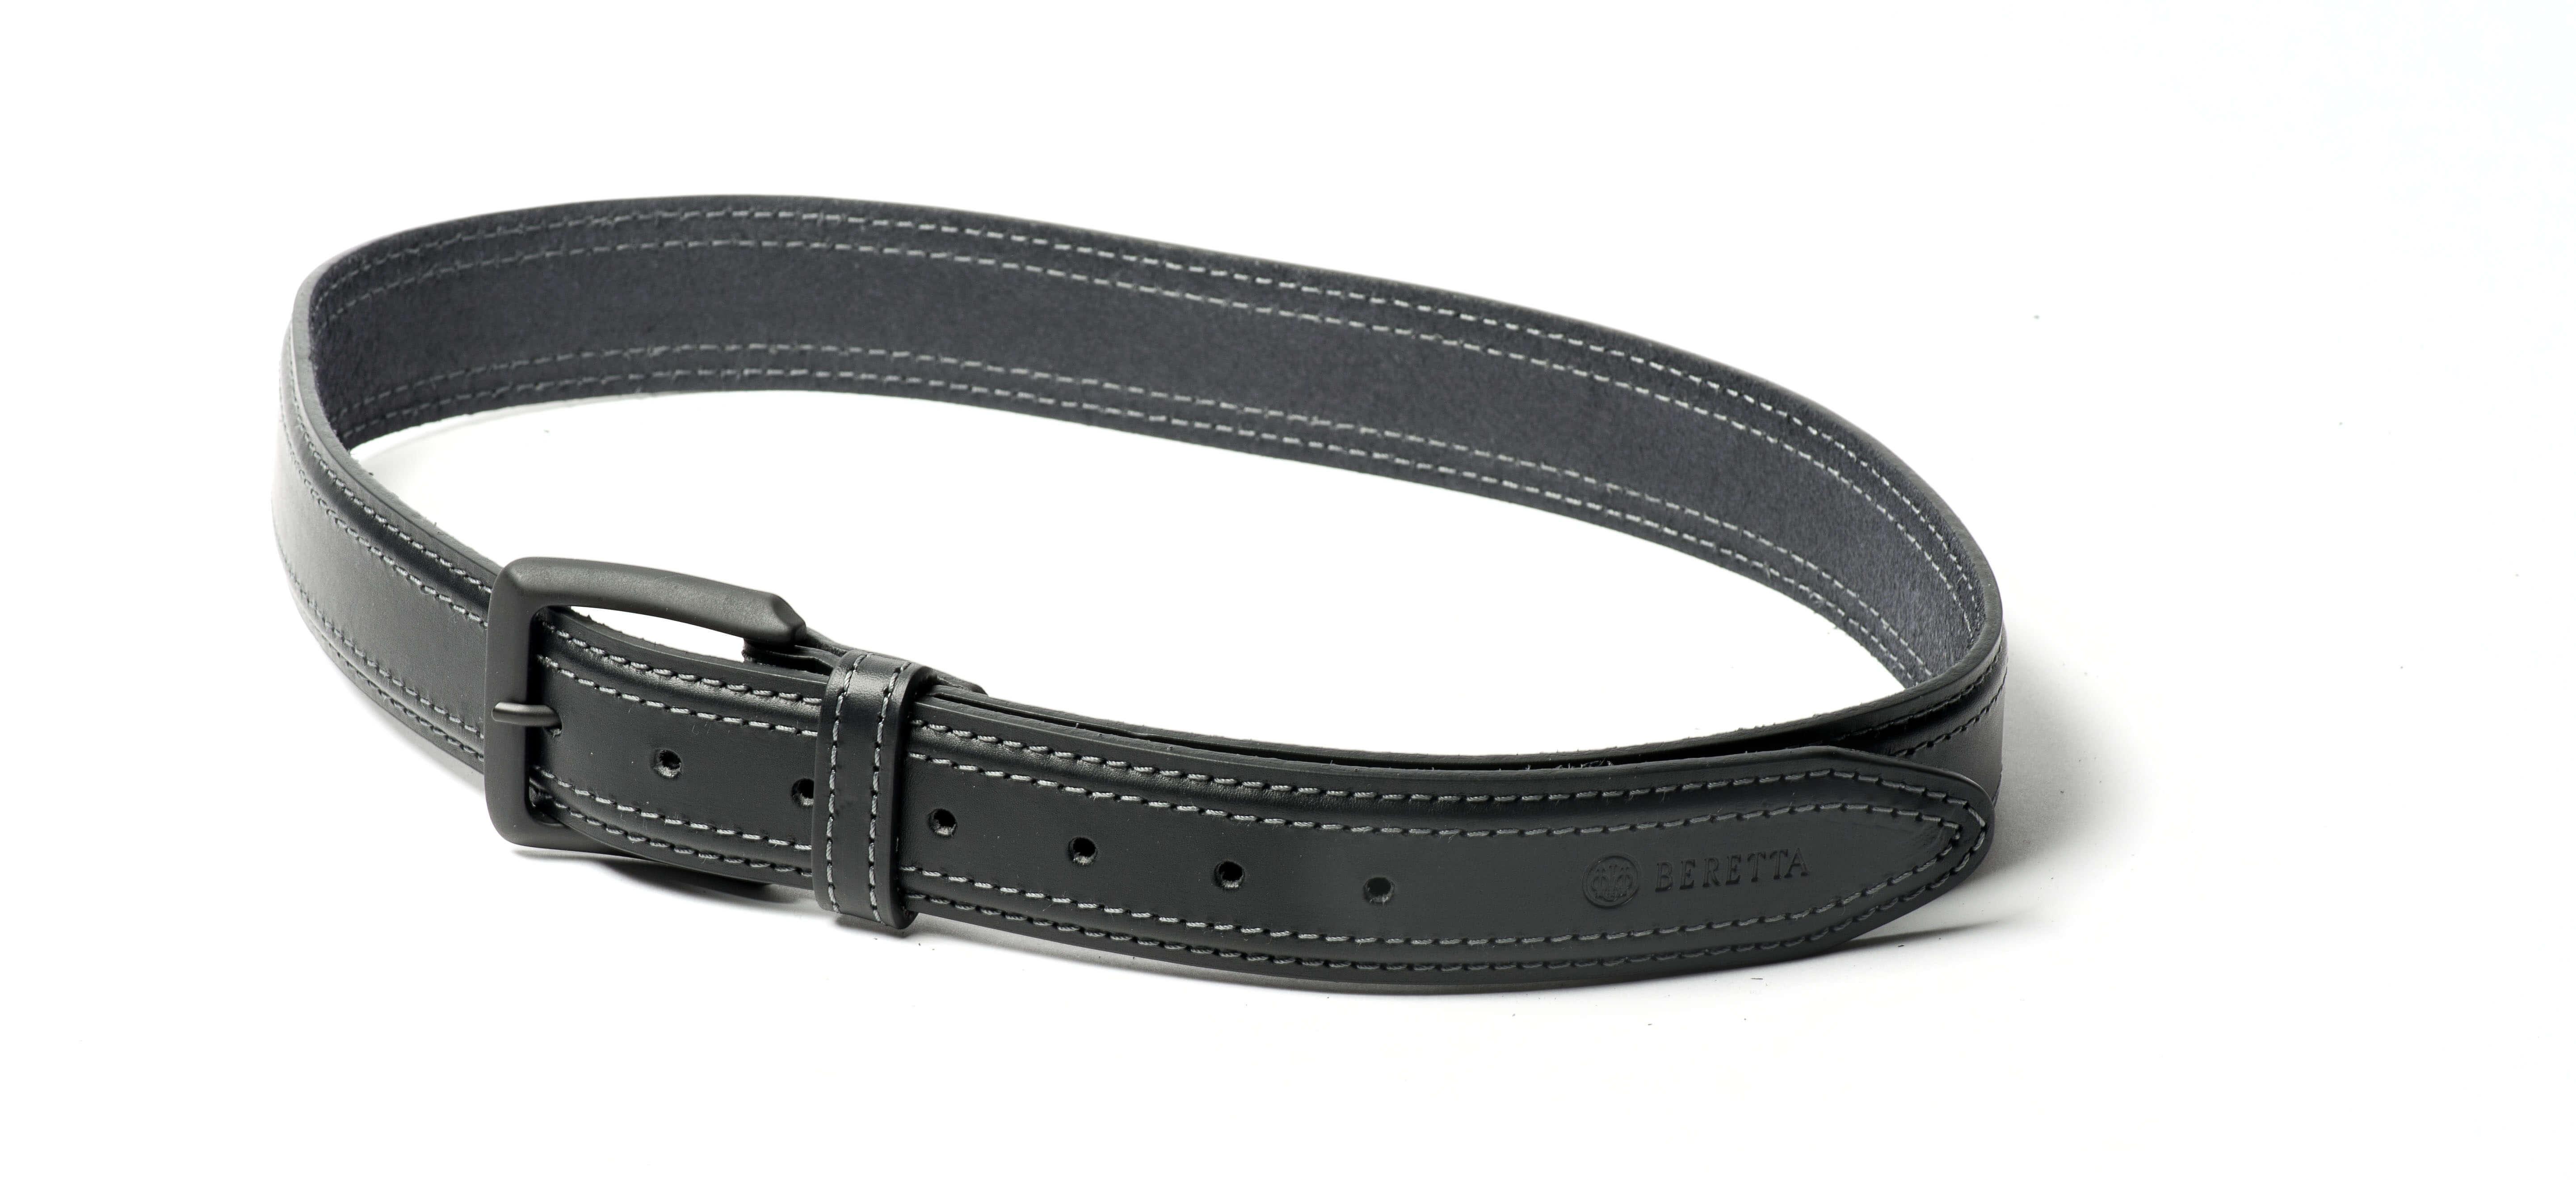 BerettaUSA   Tactical Belt in Black, Leather, Size: XL